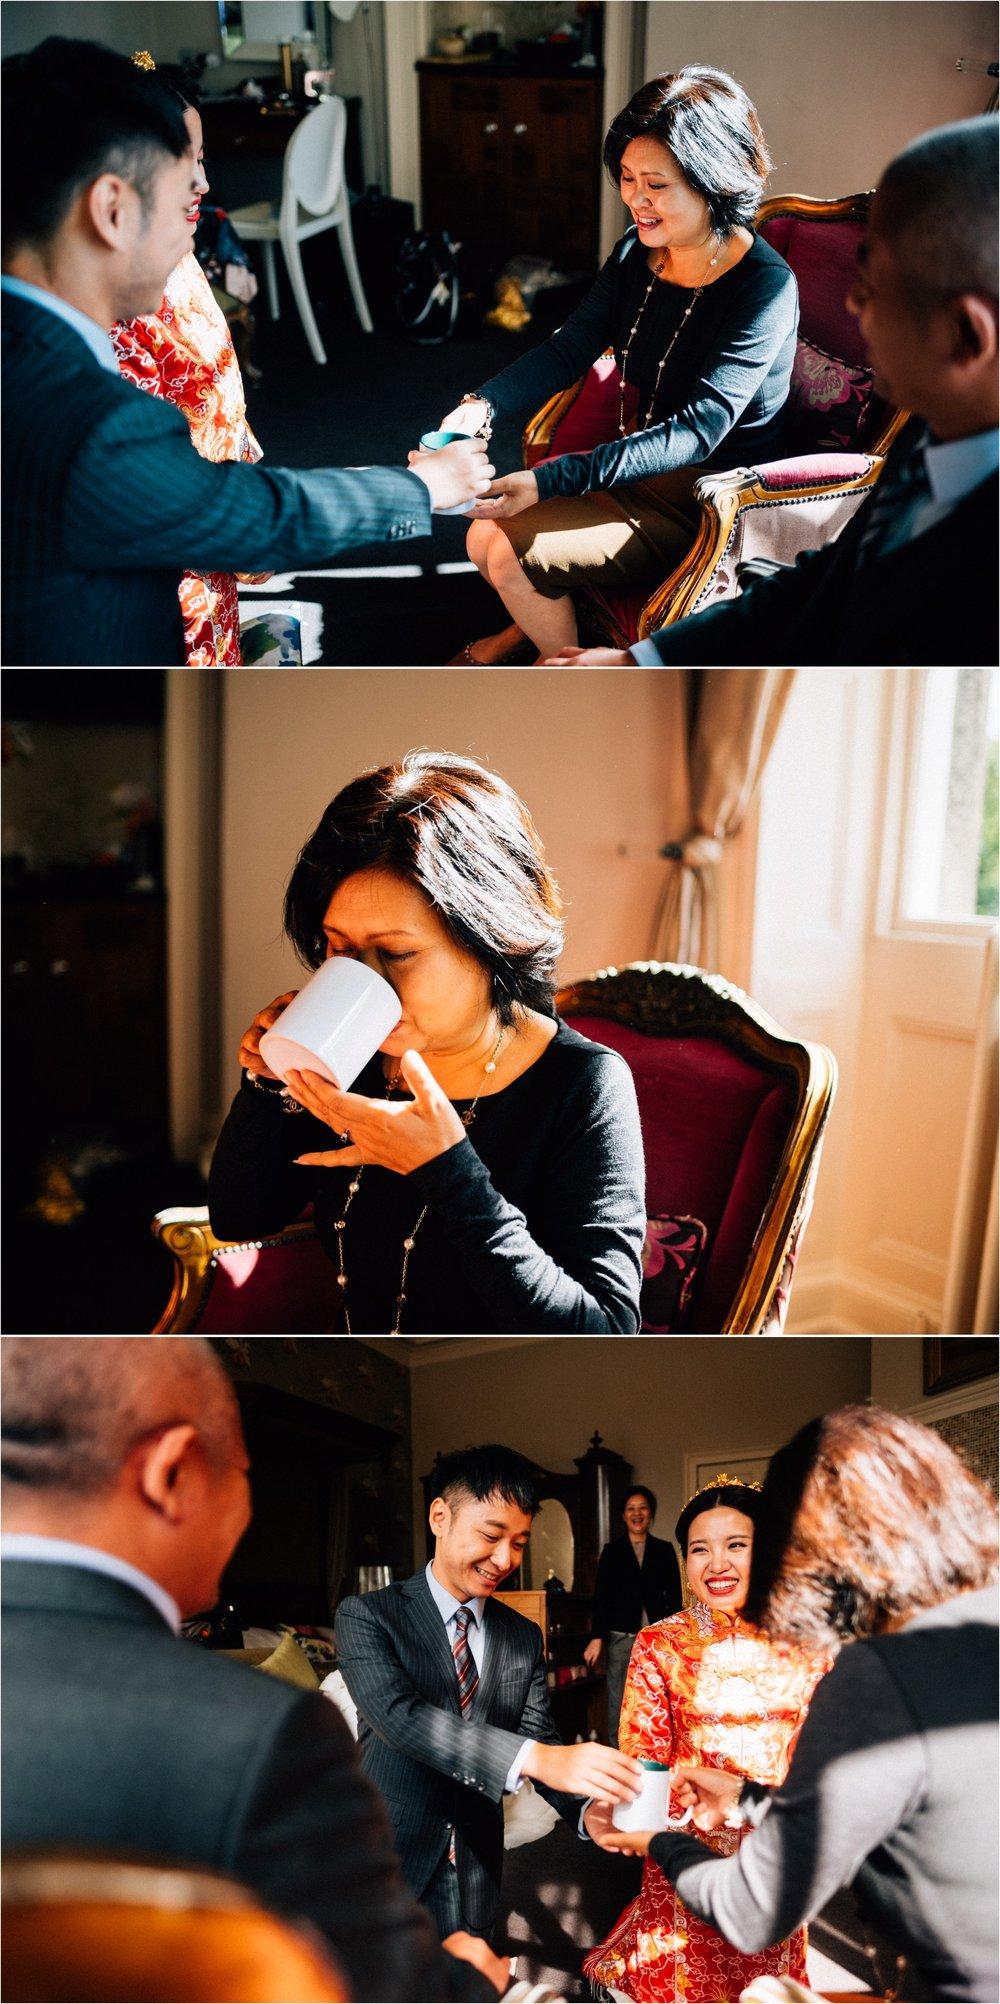 York city elopement wedding photographer_0165.jpg